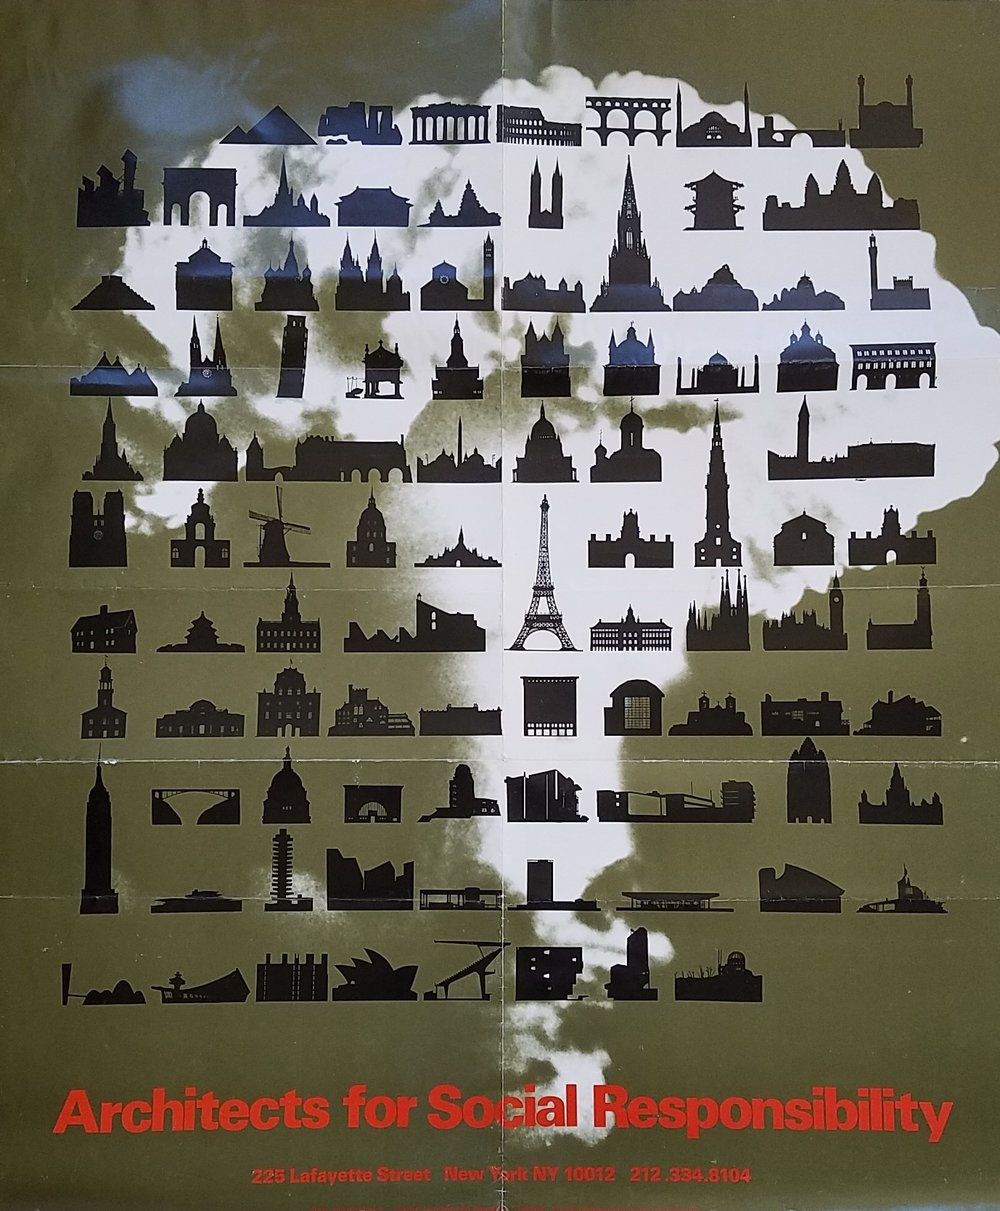 ArchitectsForSocialResponsbility.jpg